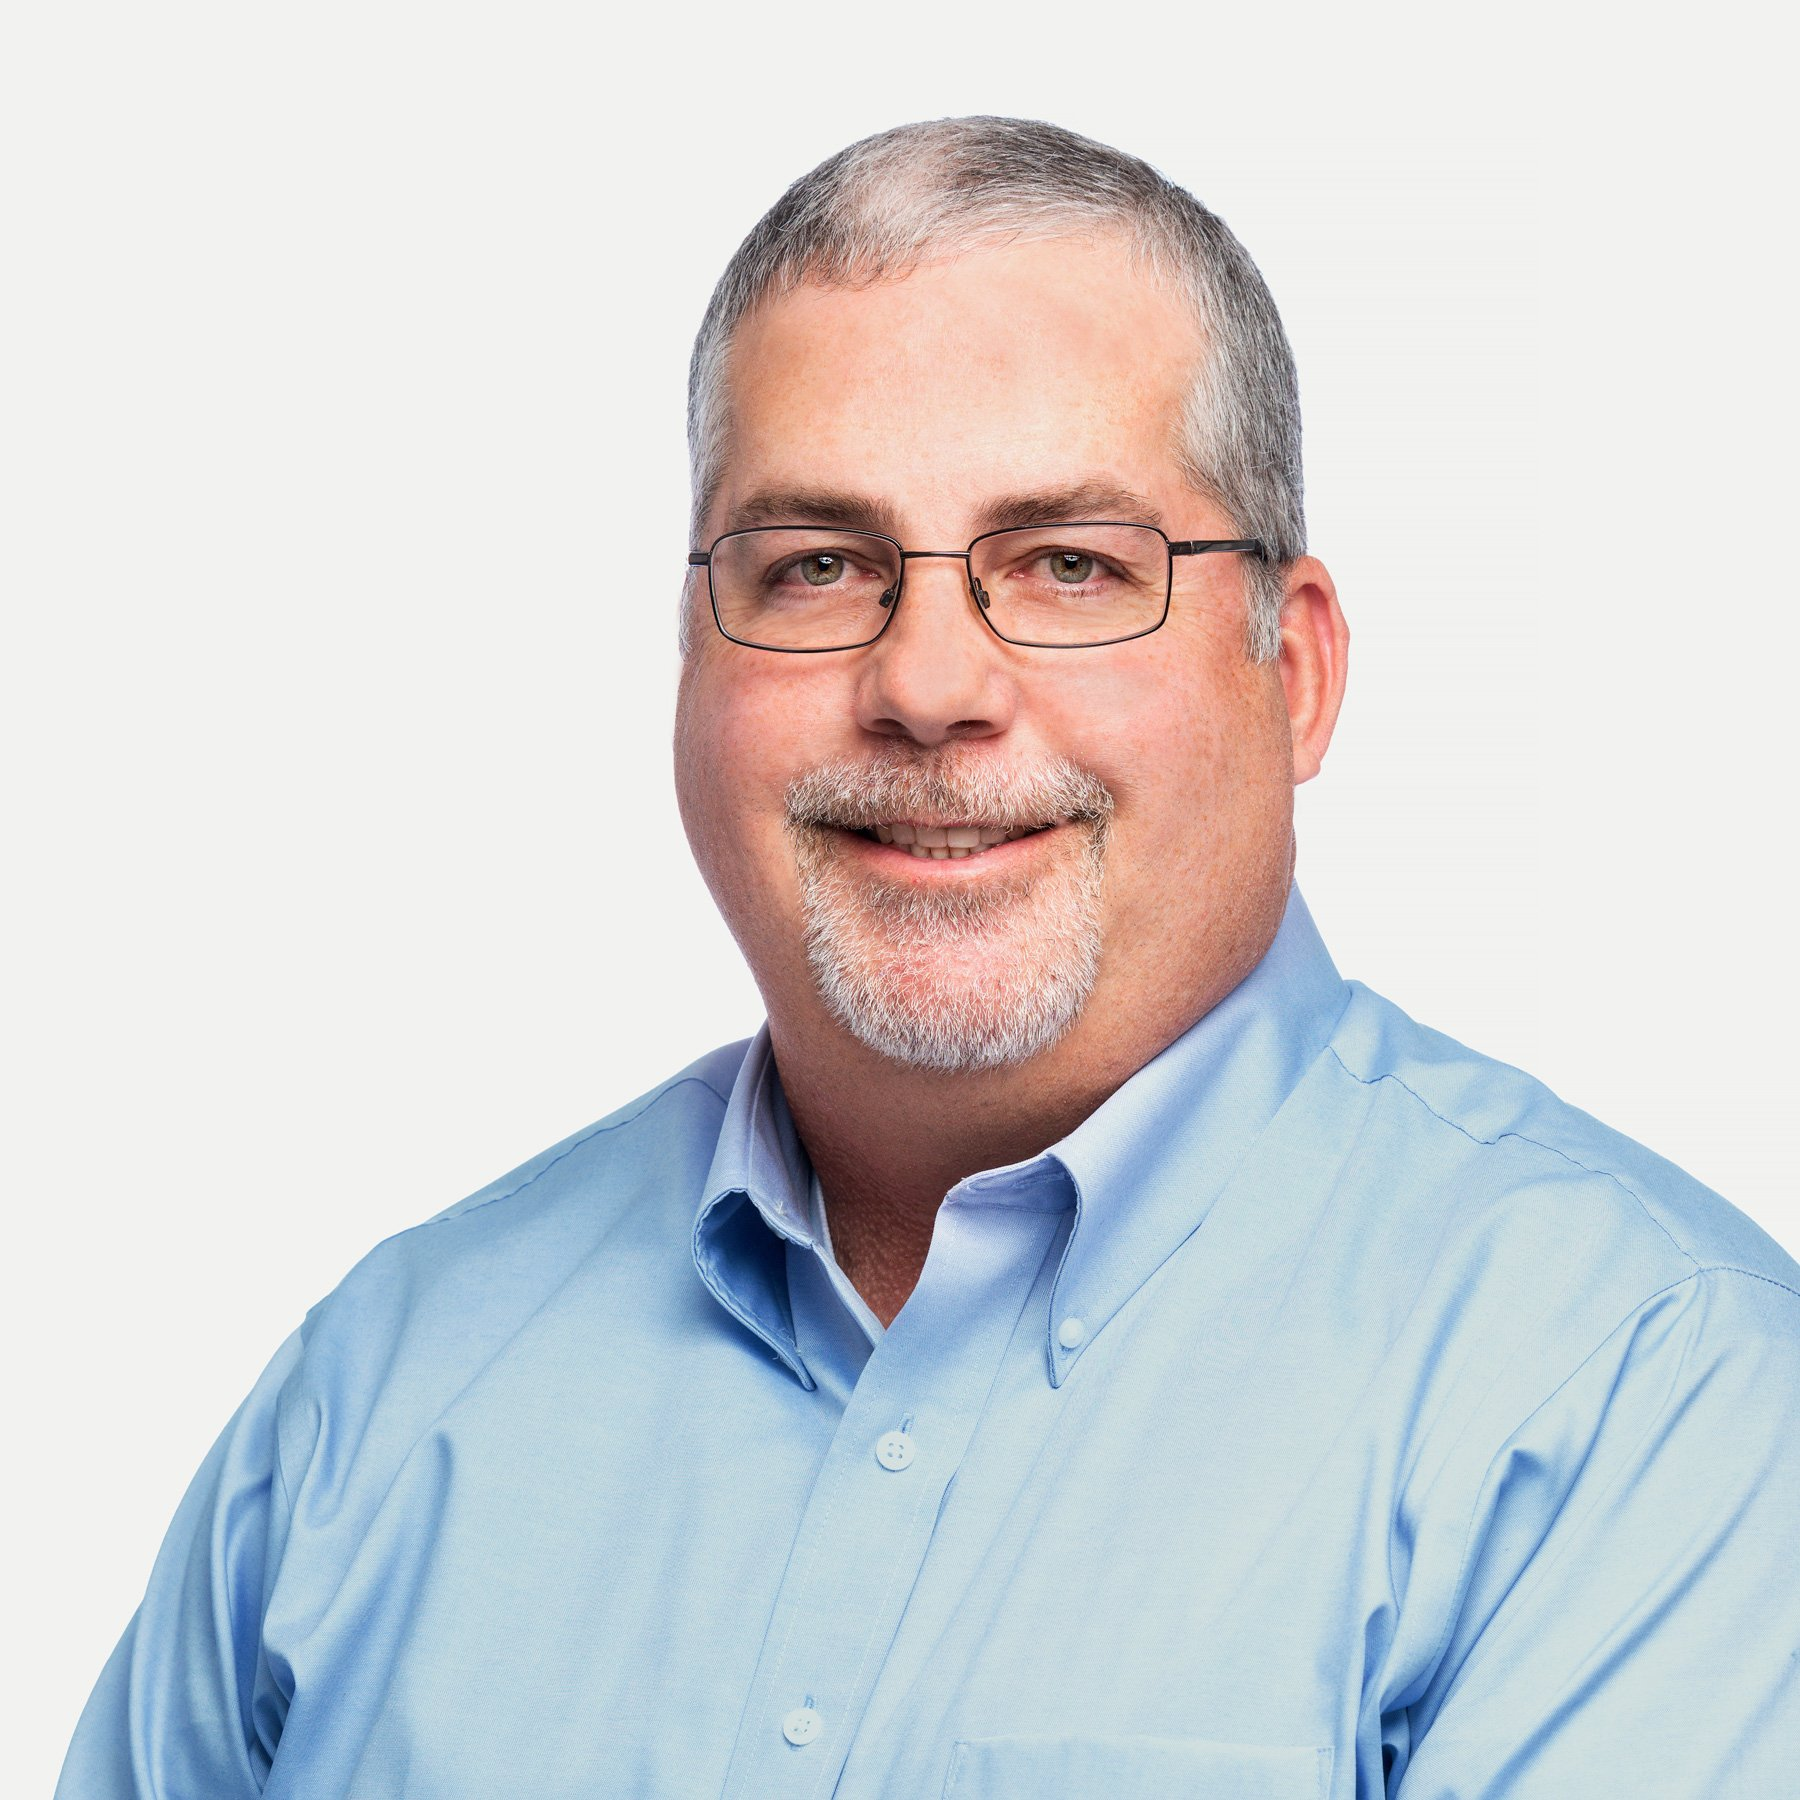 Steve-Duncan-Chief-Operating-Officer